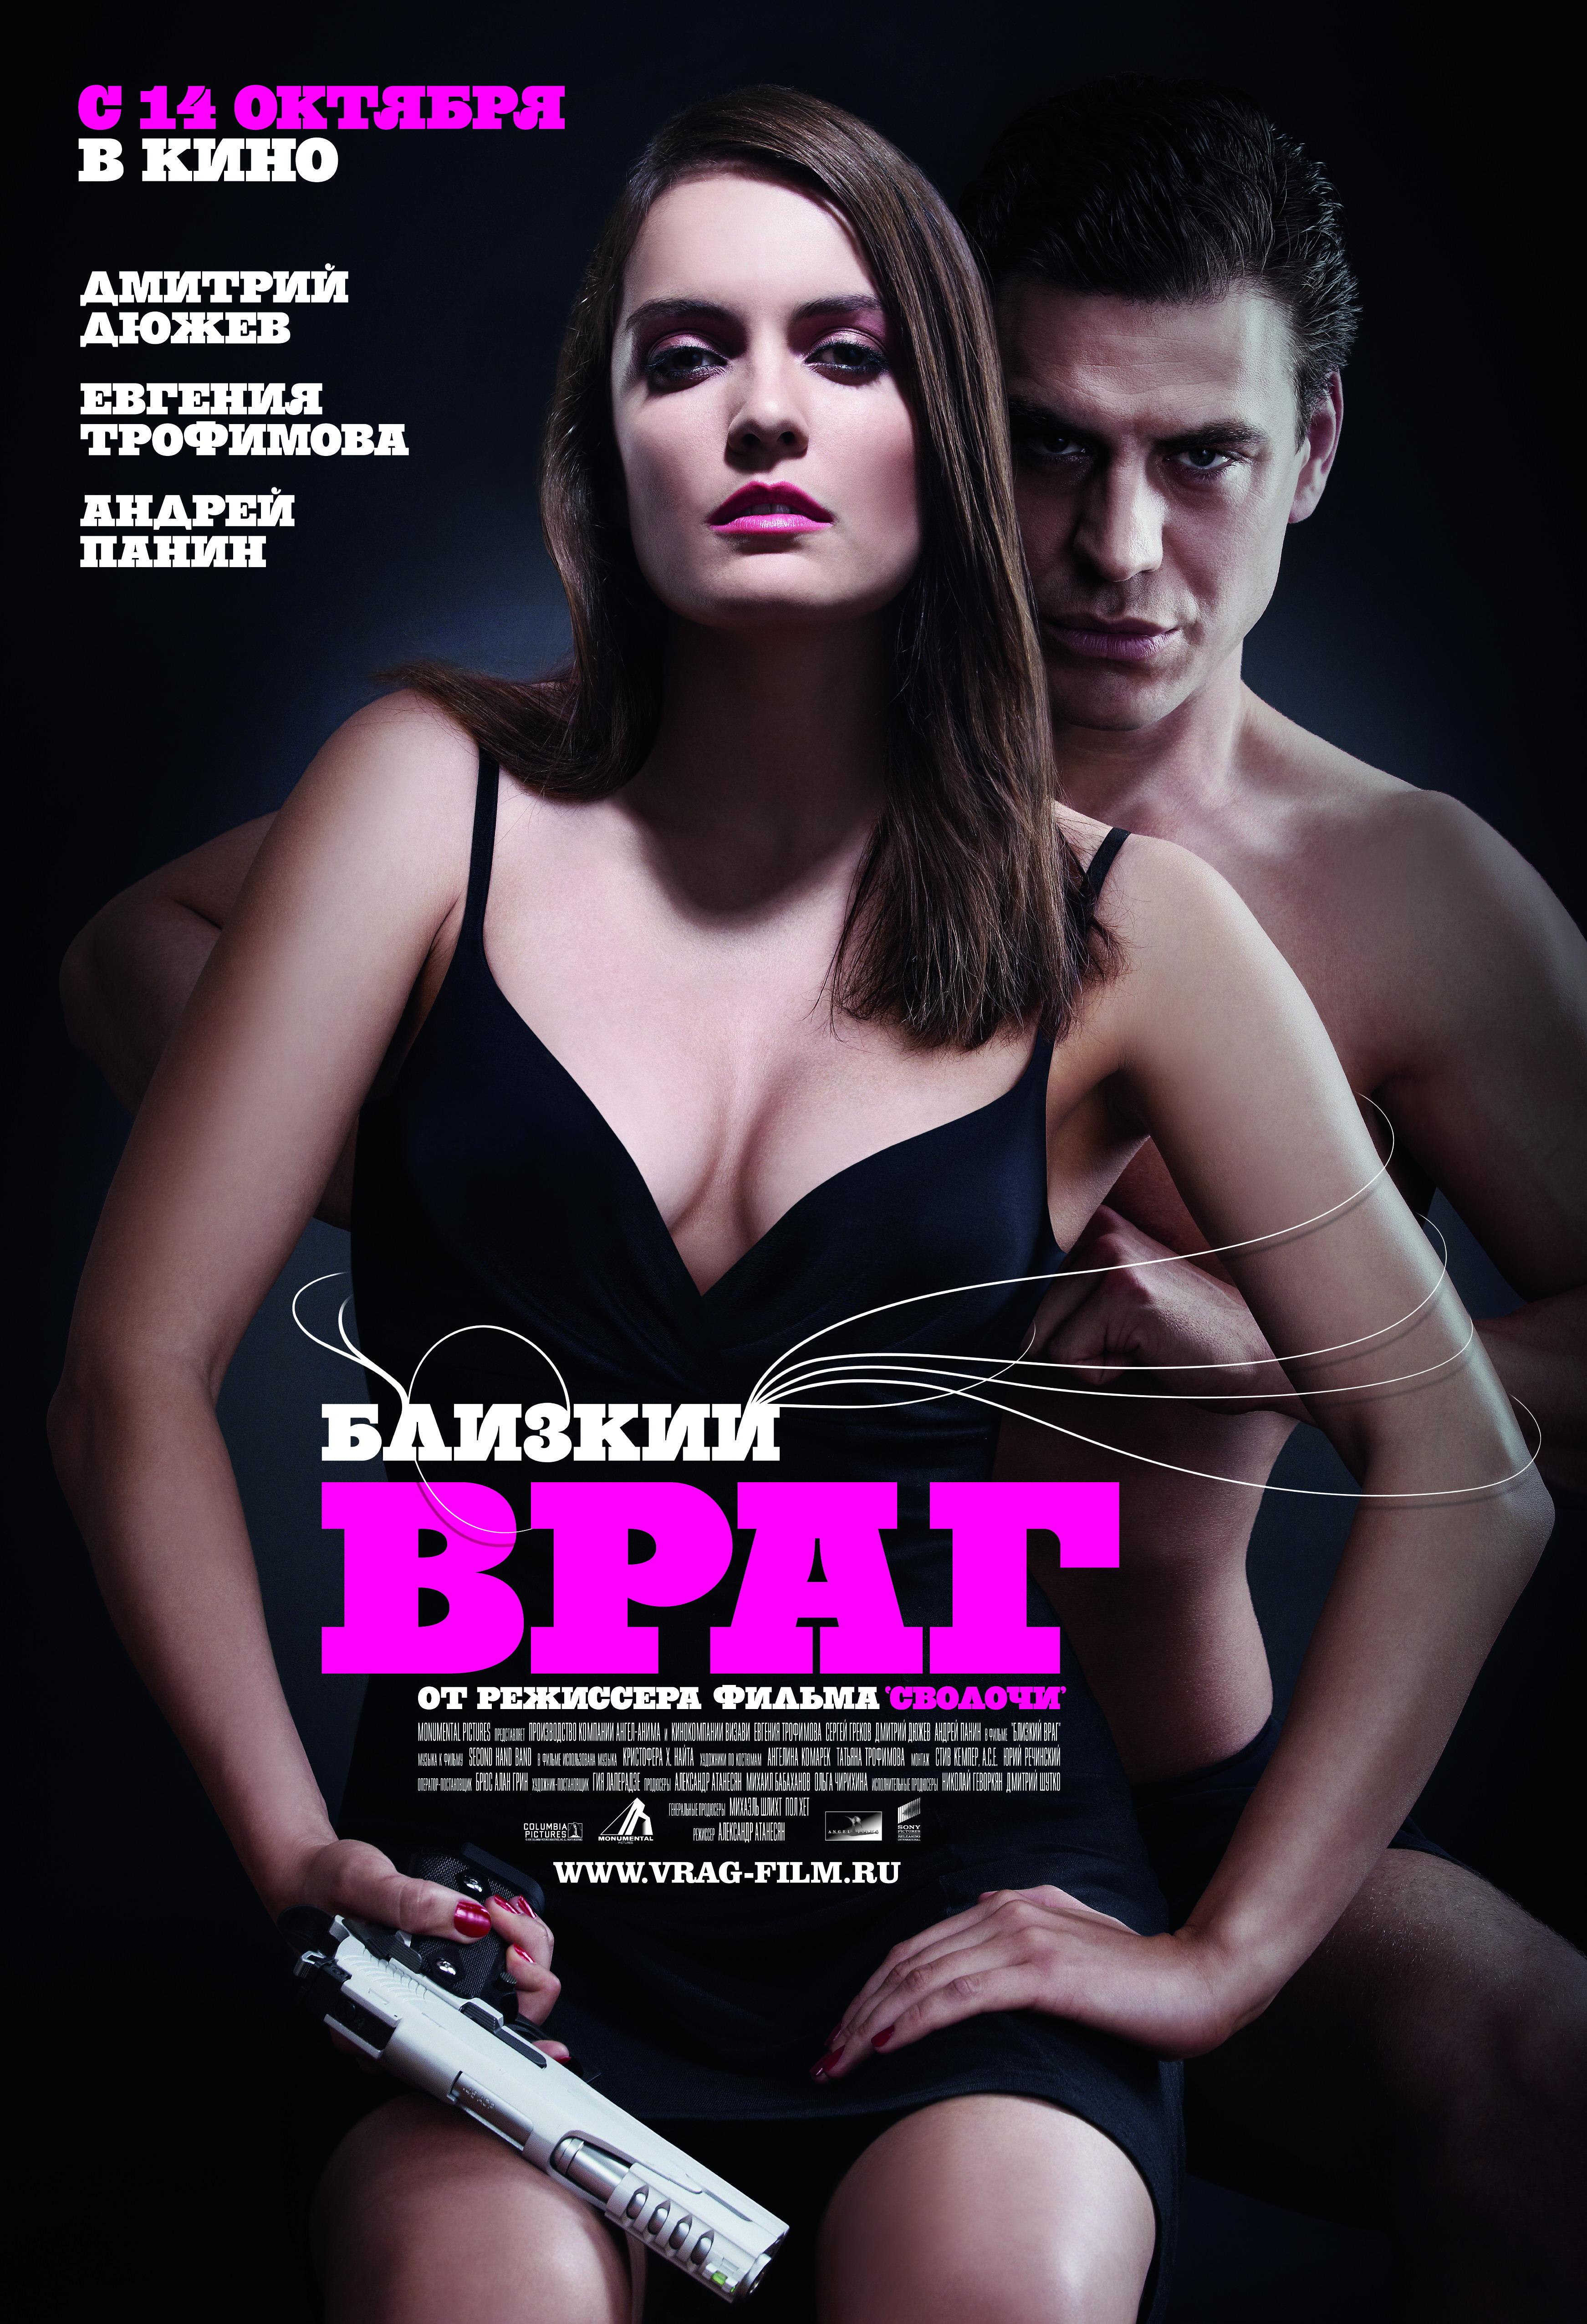 Без границ (2015) смотреть онлайн в